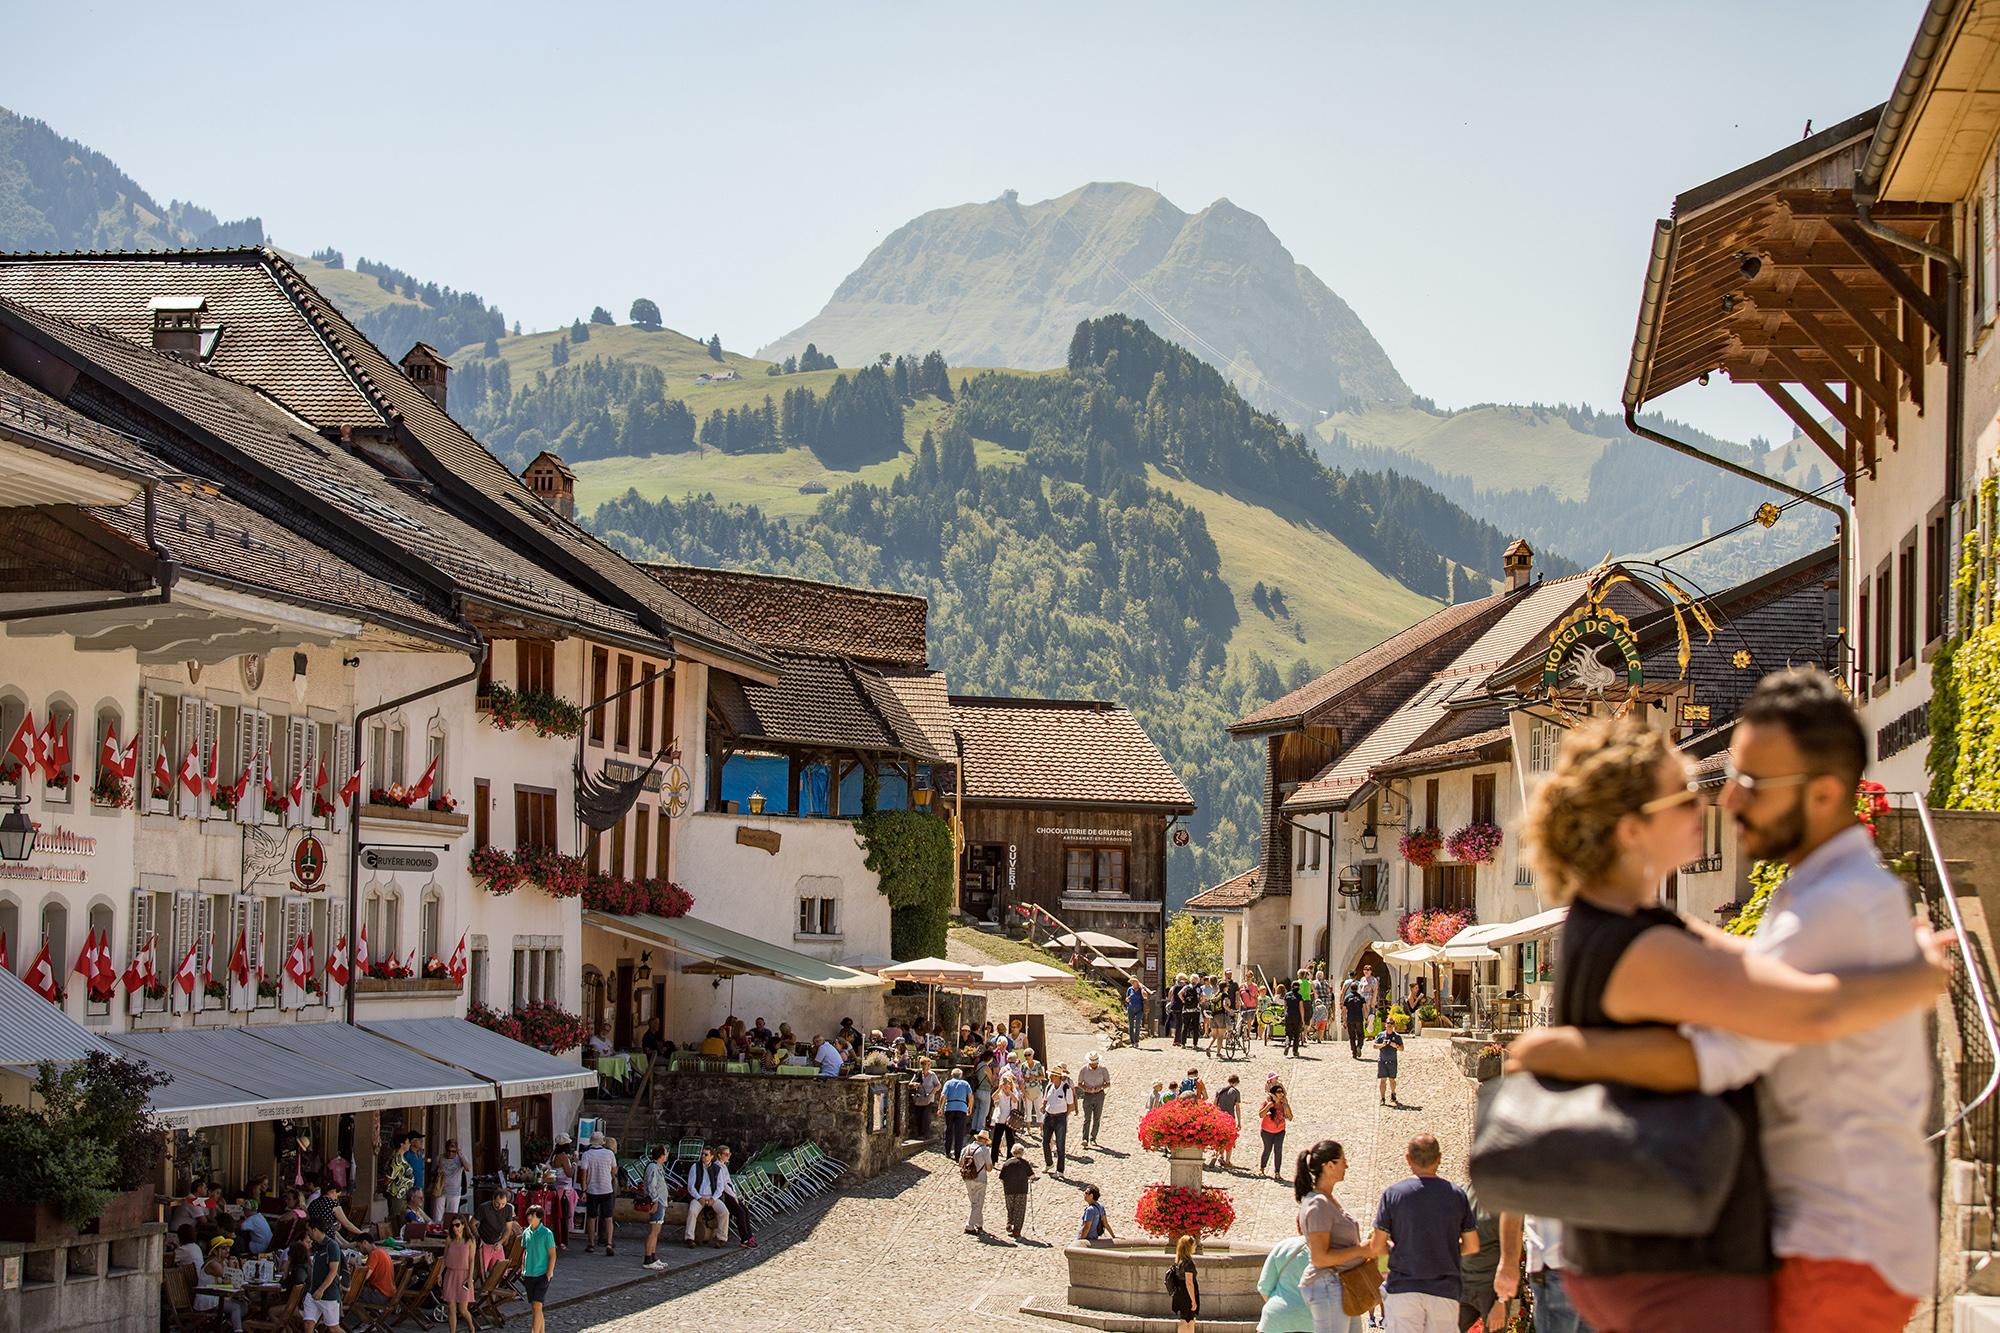 kt_2020_350_Keytours_excursions_Swisstours_gruyères_village2_2048_10